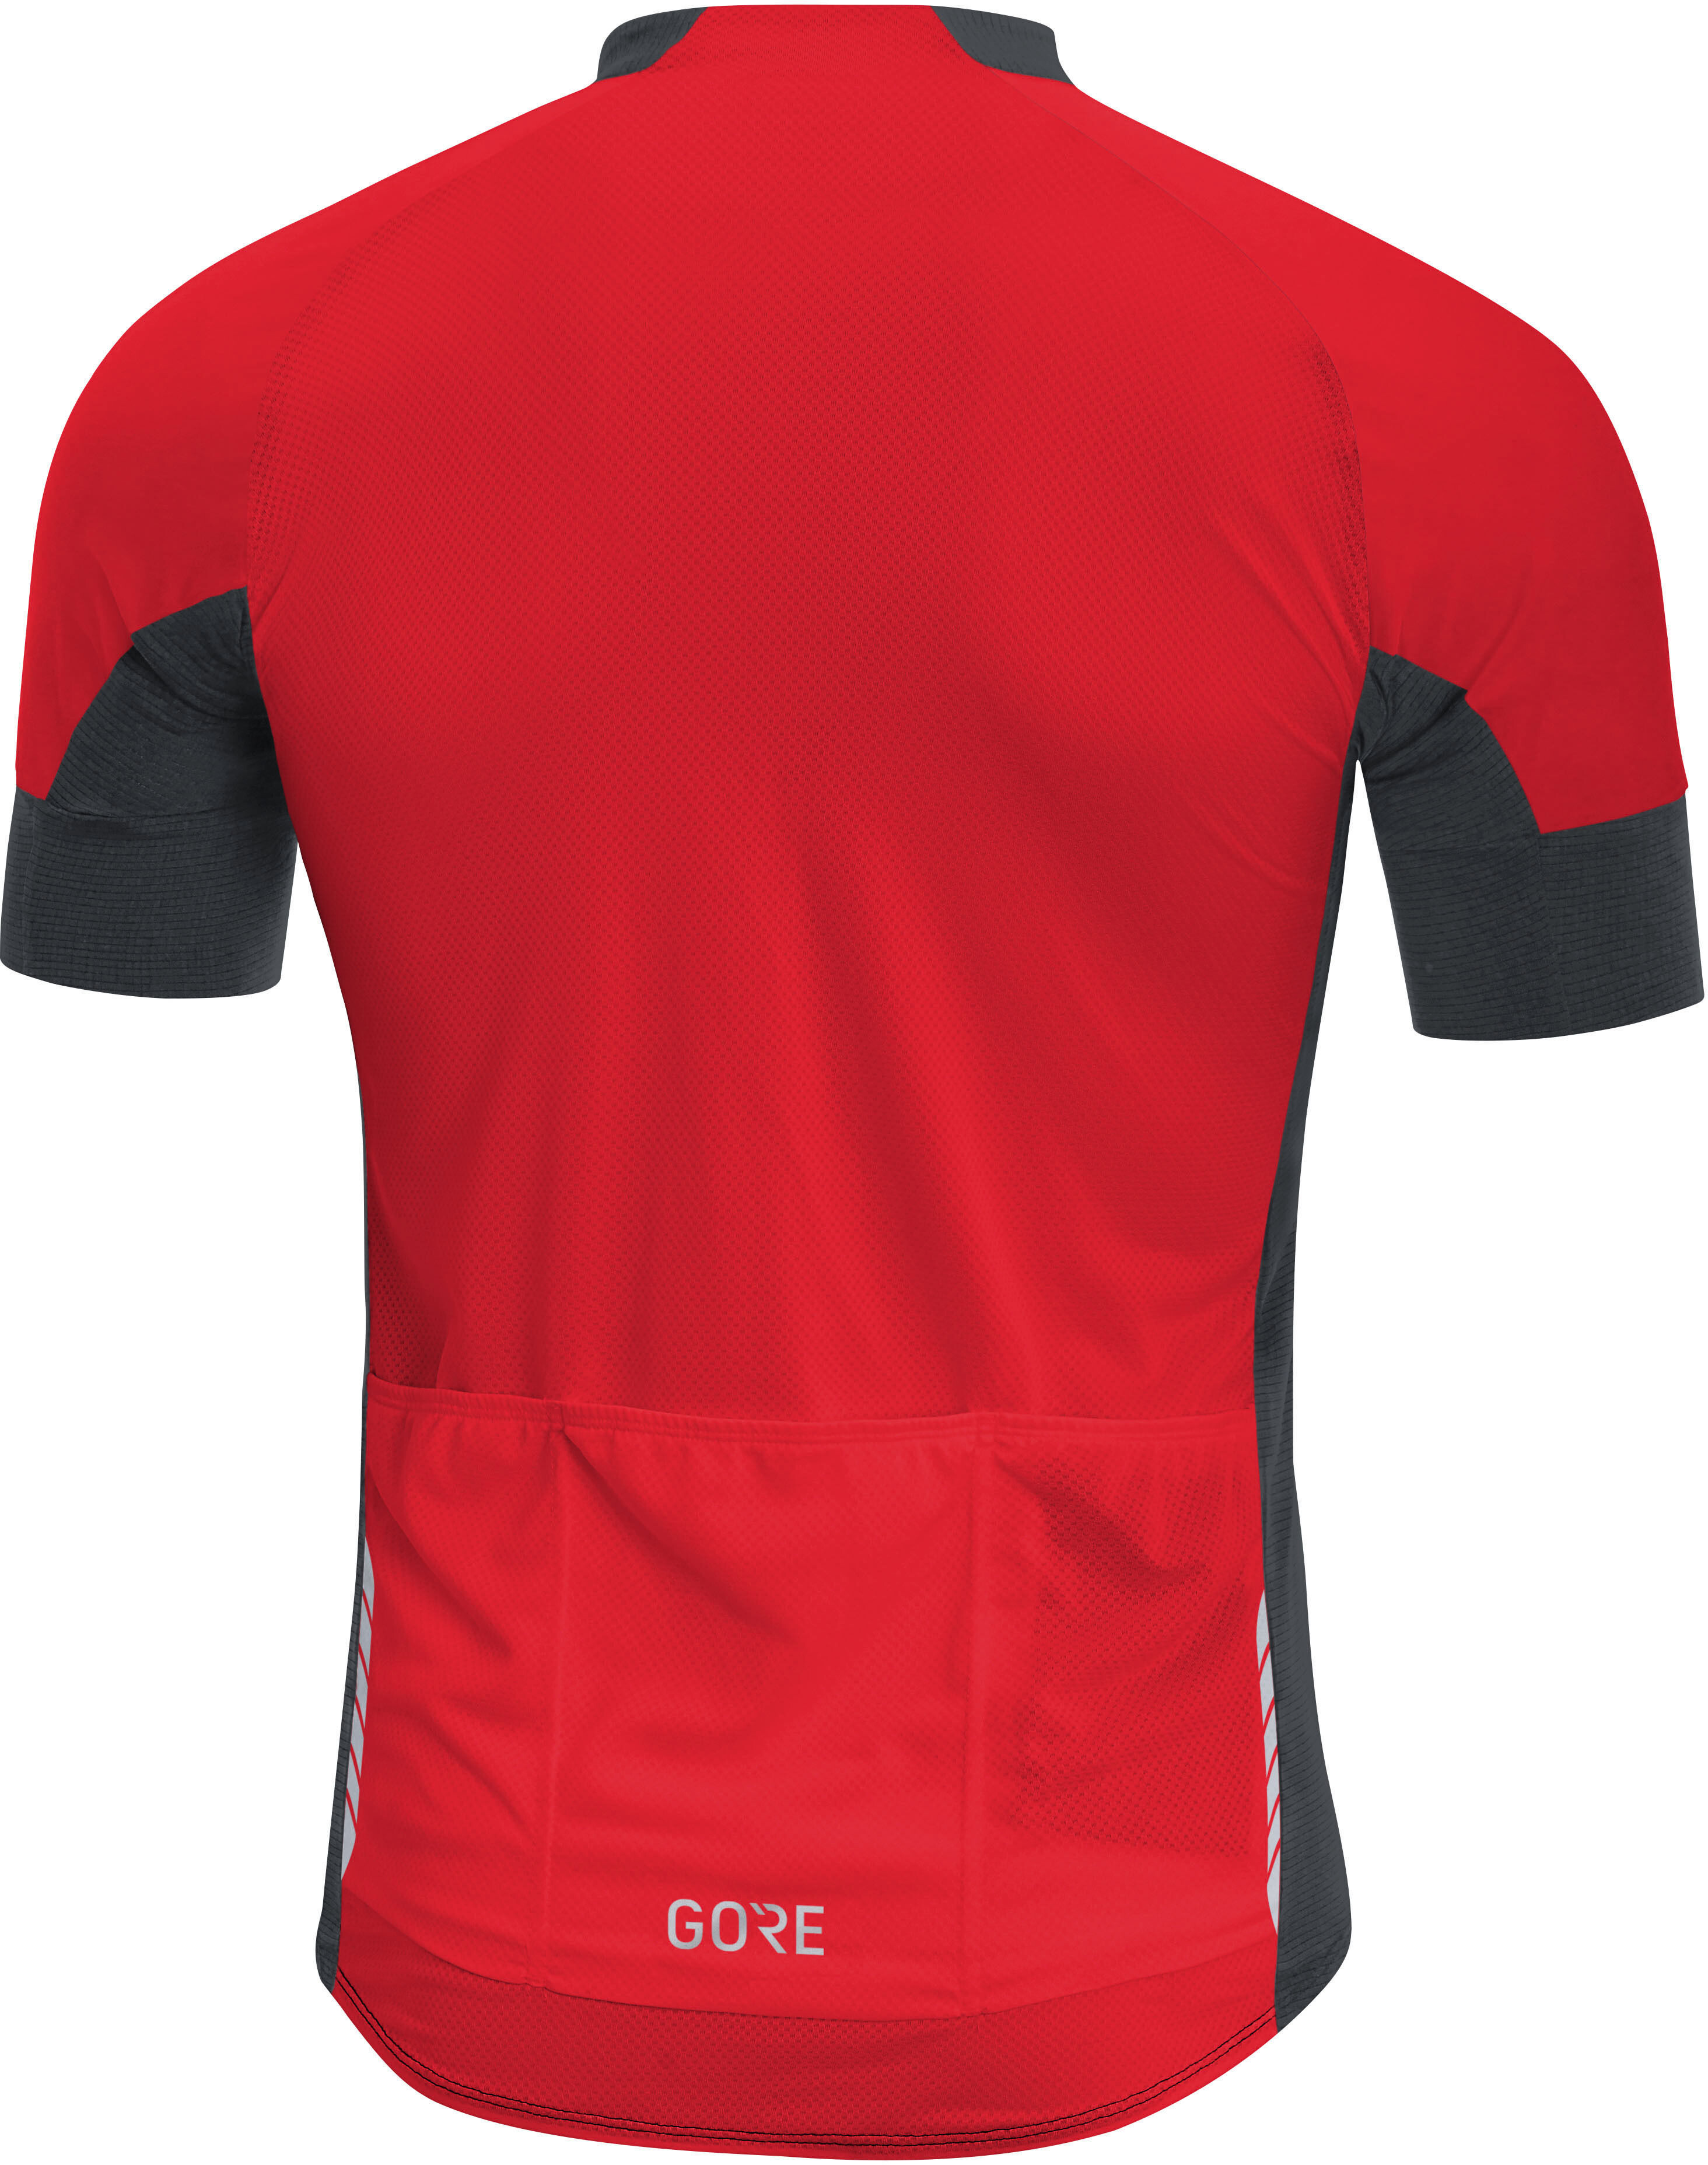 4f65a2362 GORE WEAR C7 CC Bike Jersey Shortsleeve Men red black at Bikester.co.uk